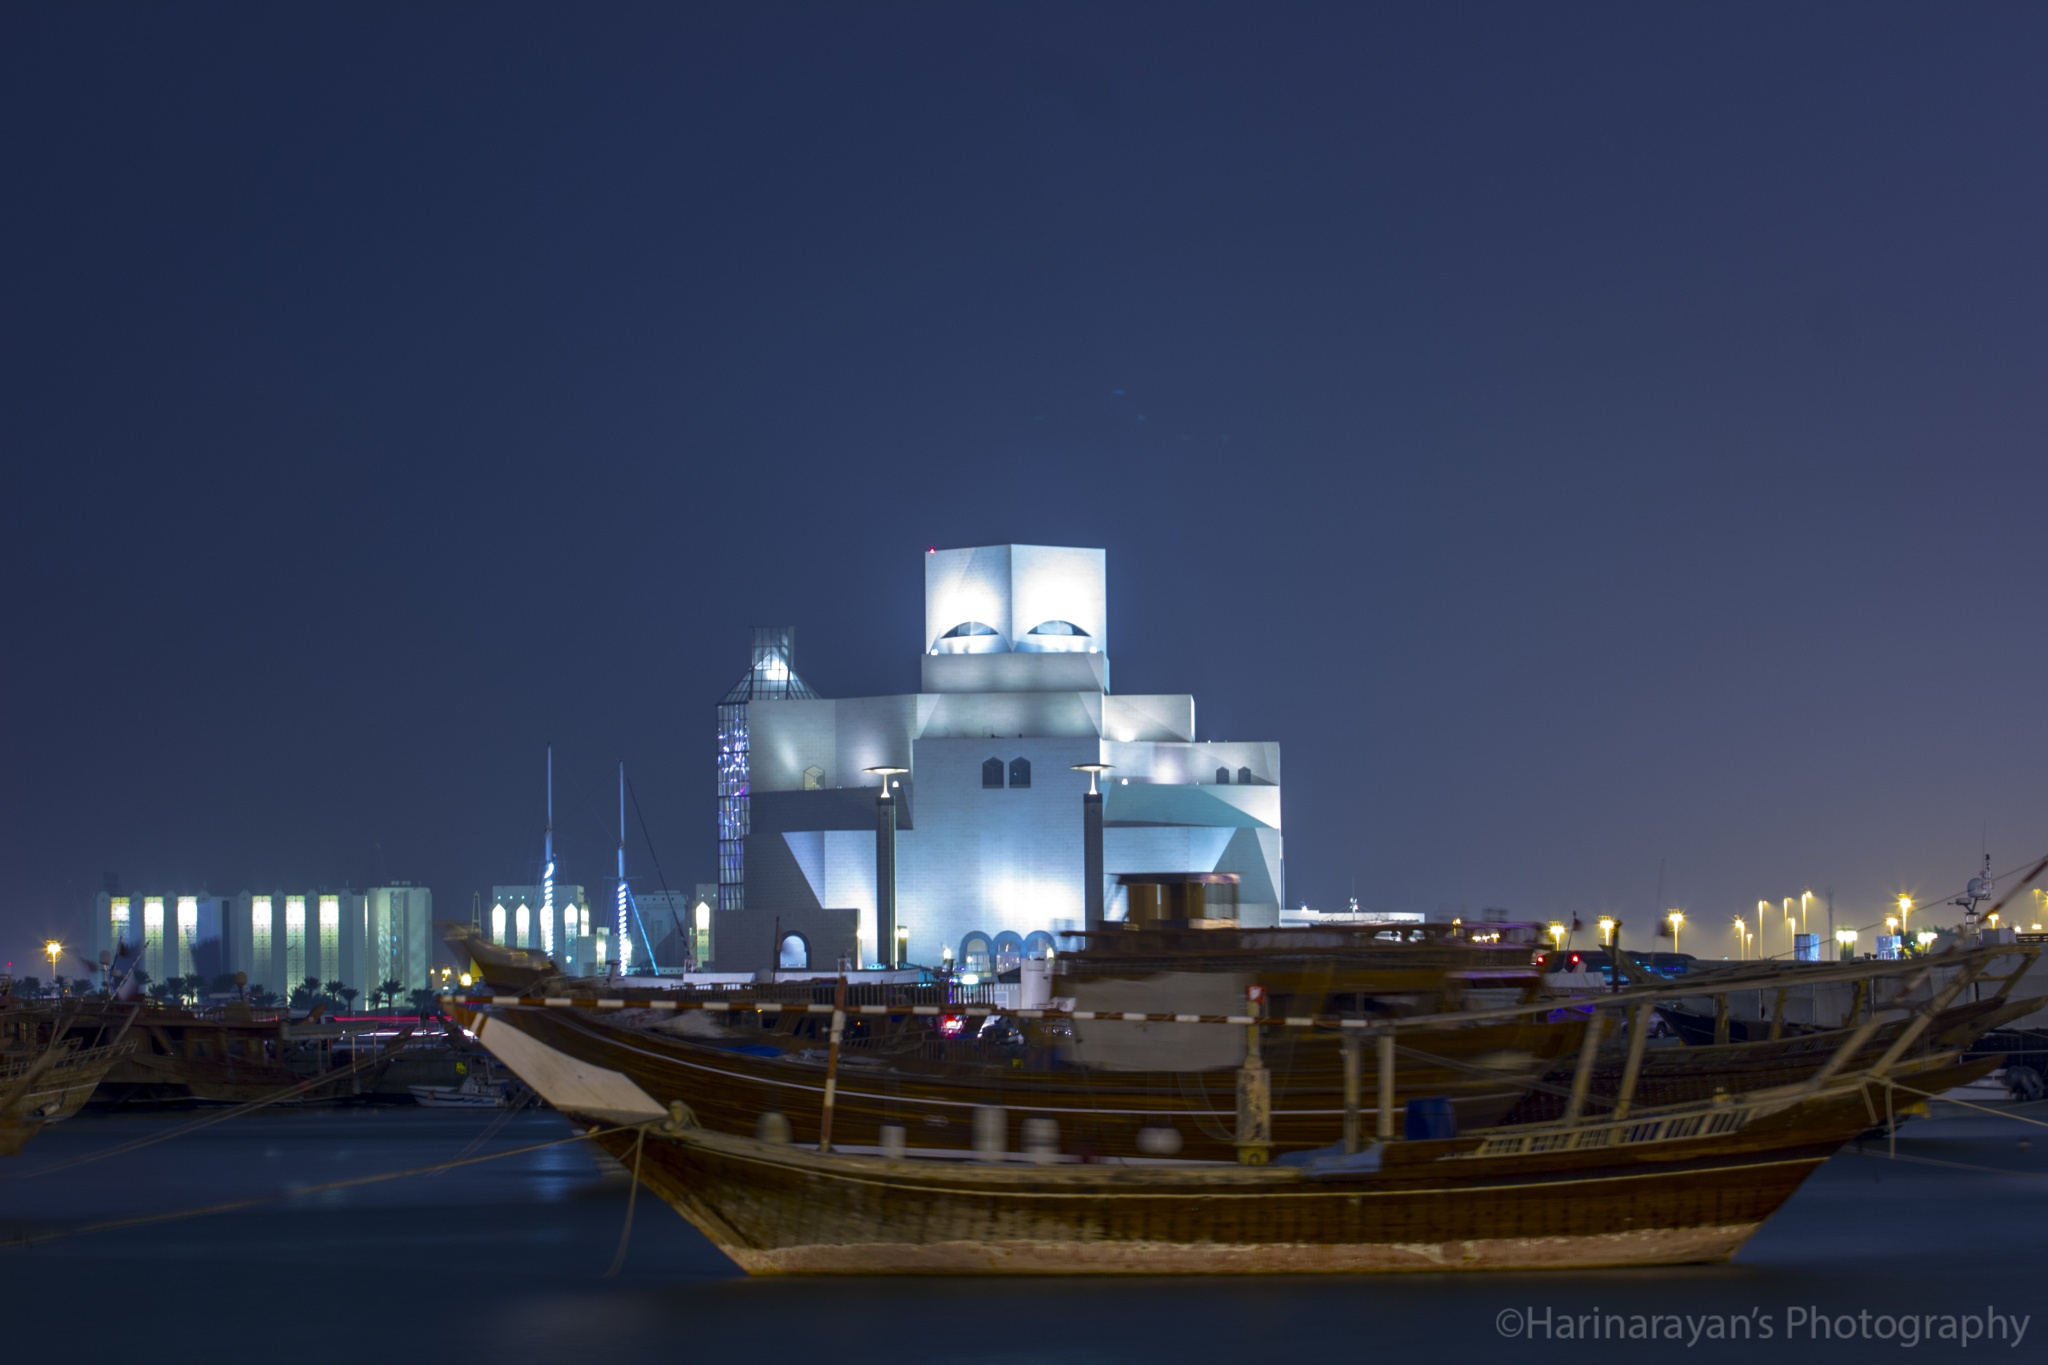 The Museum of Islamic Art, Doha, Qatar by Creative Hunt